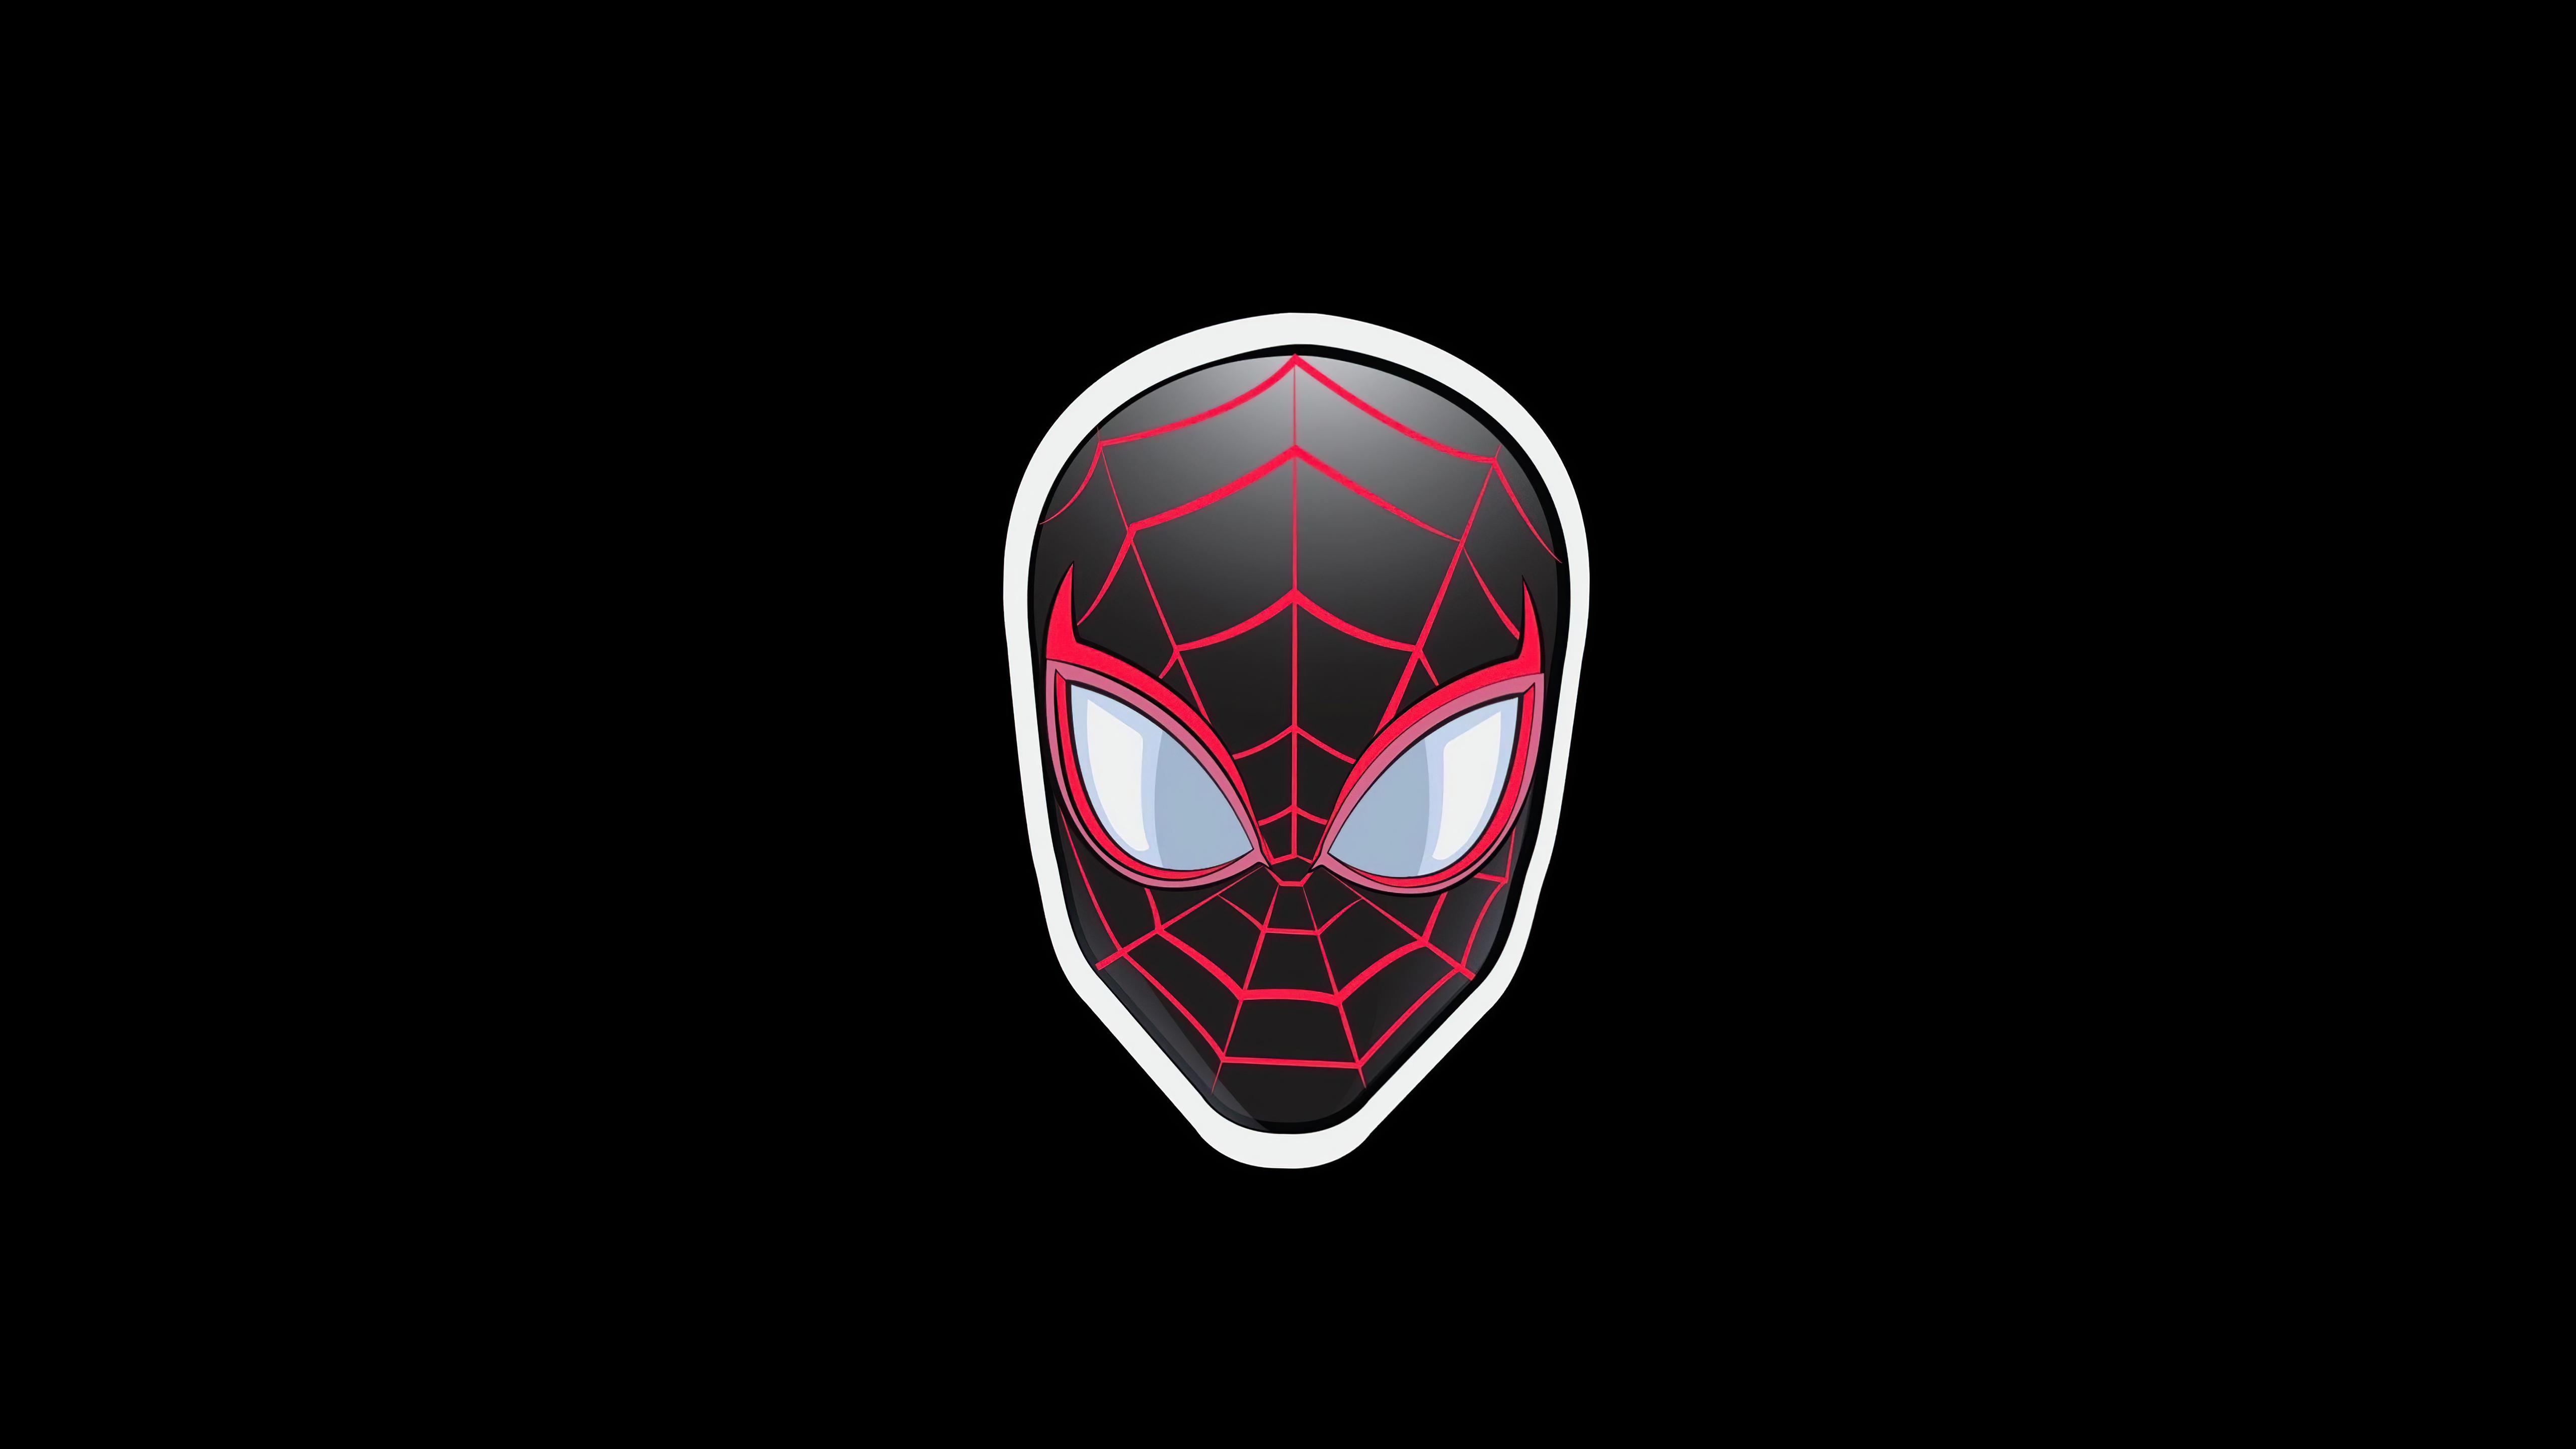 Fondos de pantalla Spider Man Sticker Minimalista